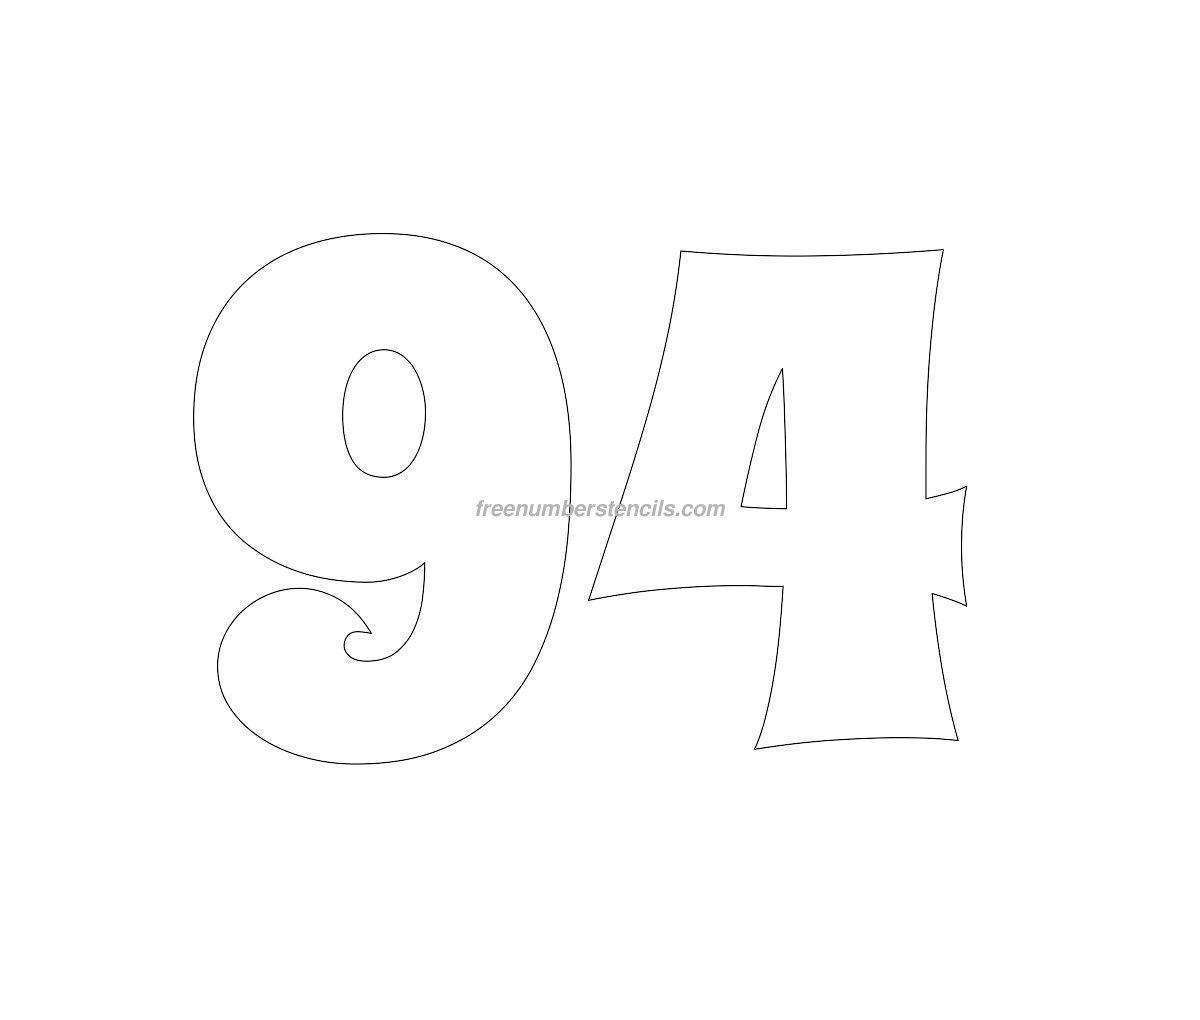 Free Groovy 94 Number Stencil Freenumberstencils Com